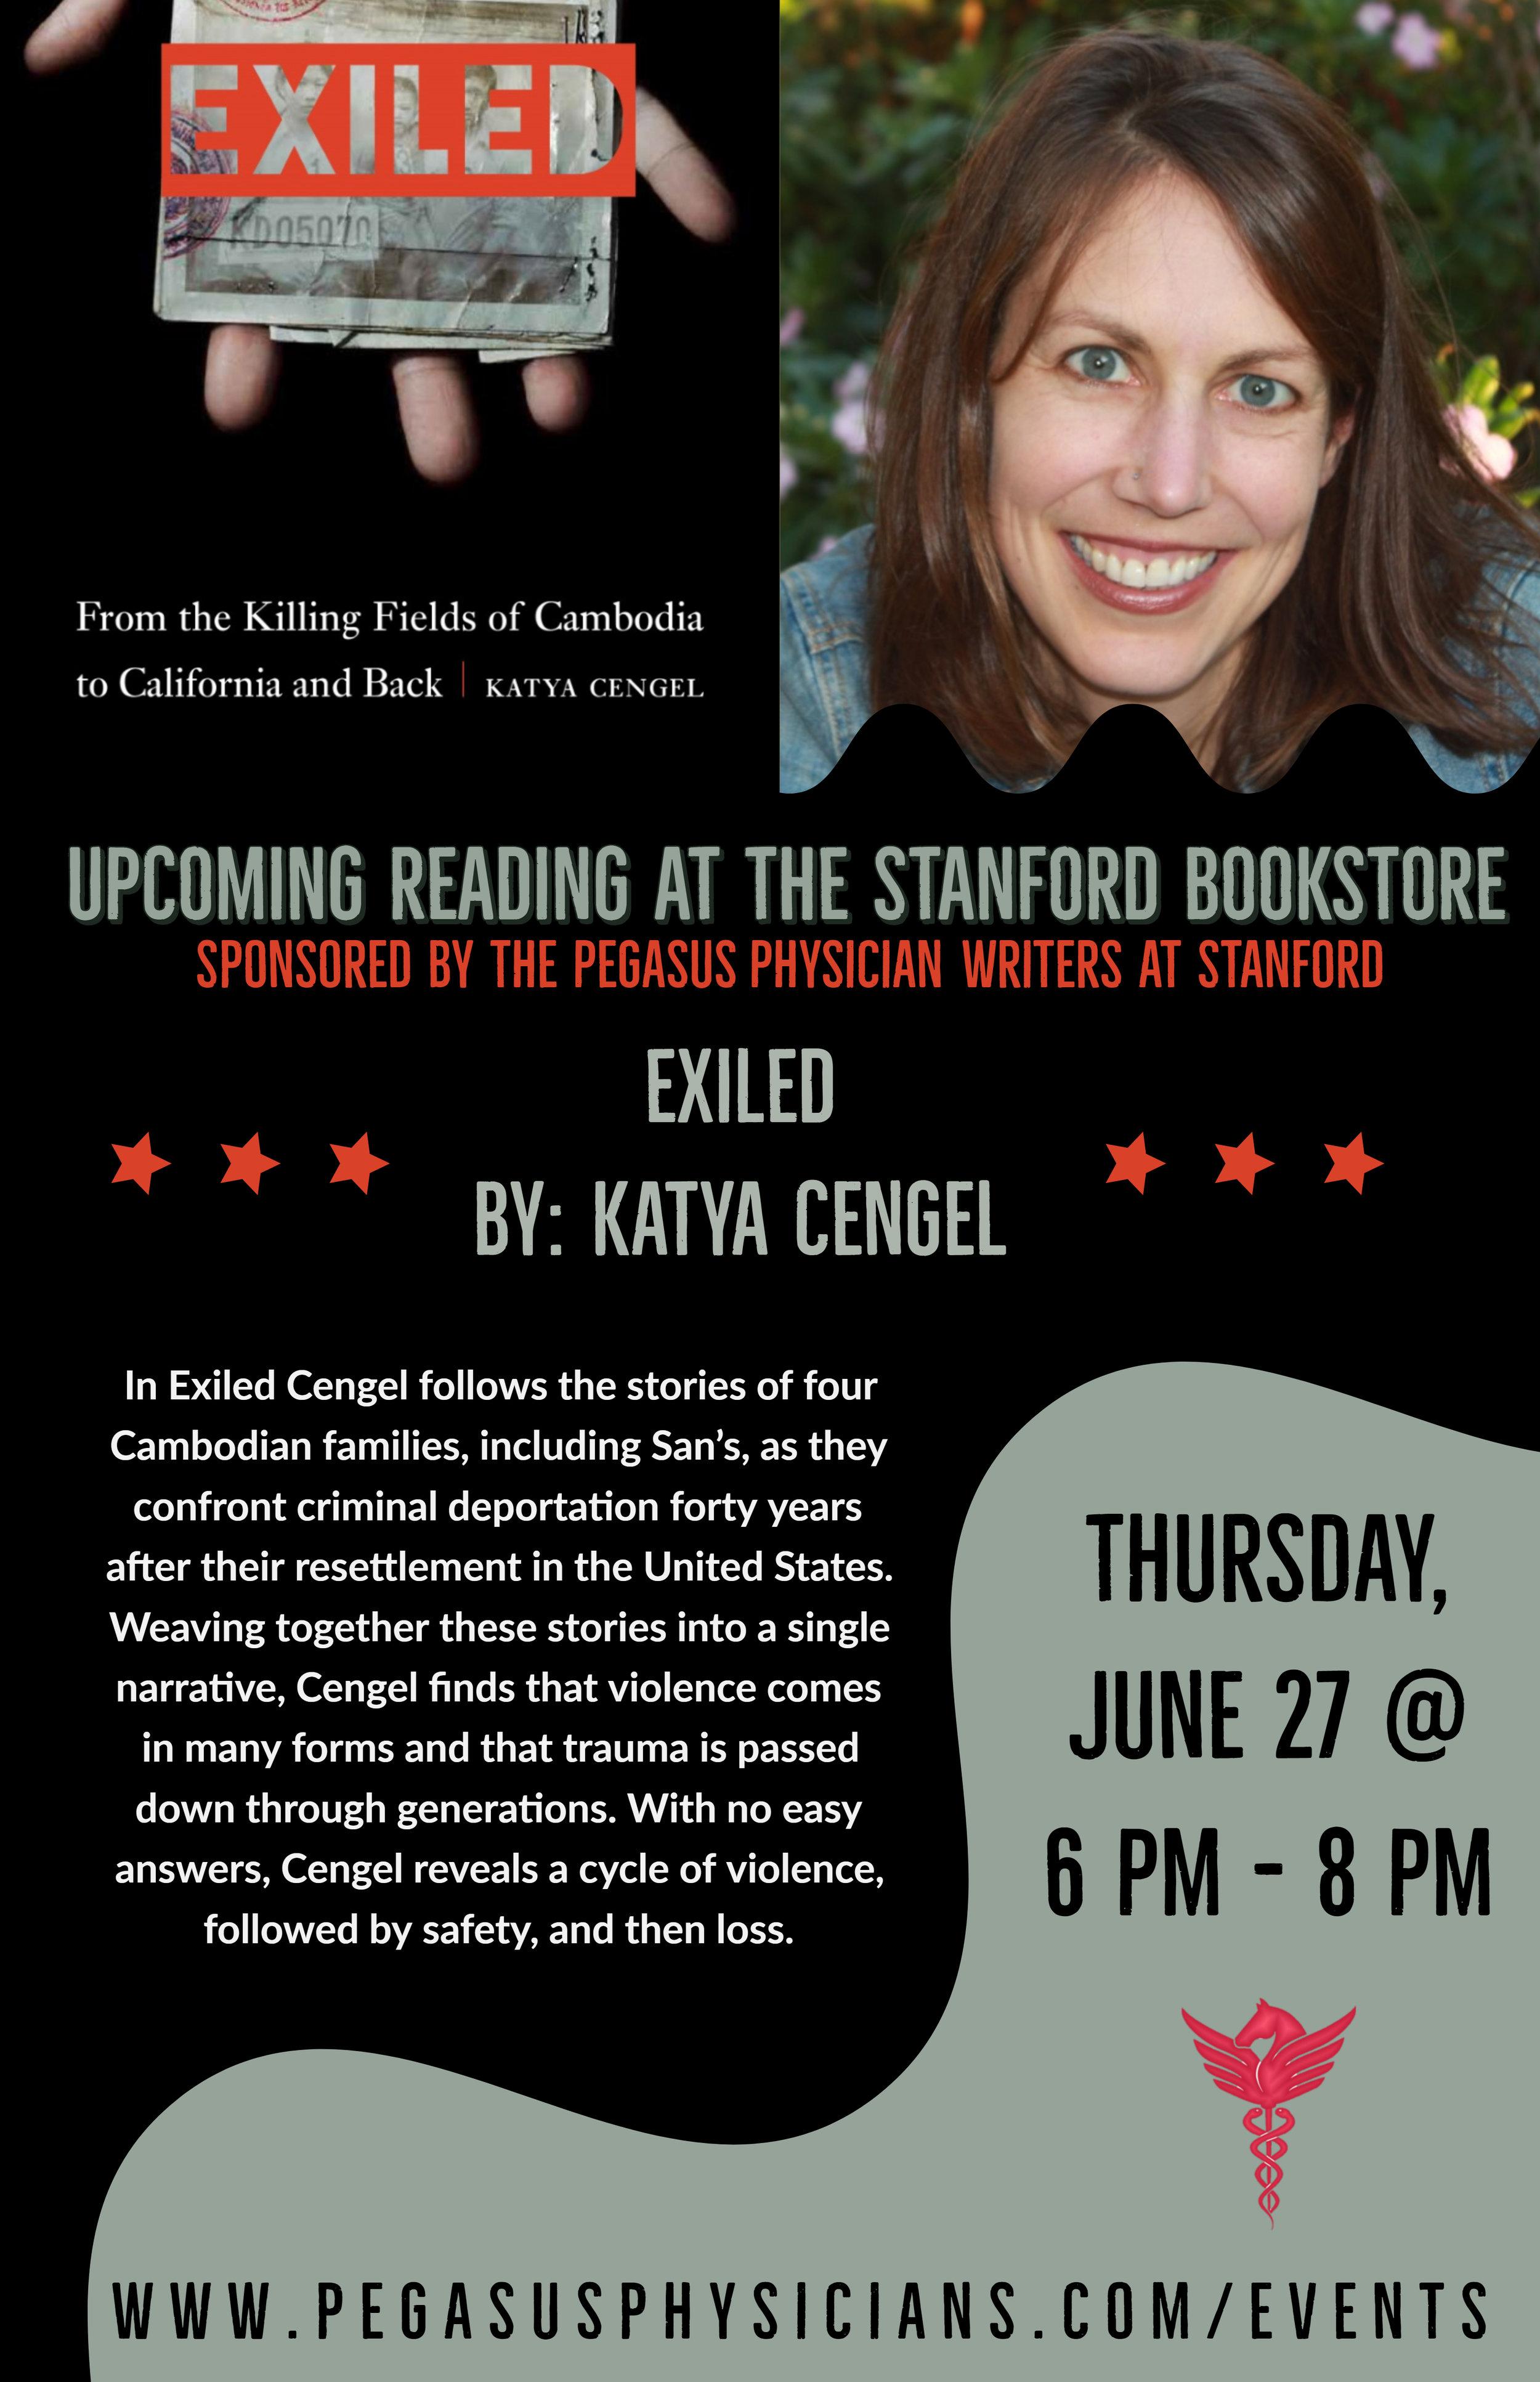 Katya Cengel Bookstore Reading_June 27.jpg